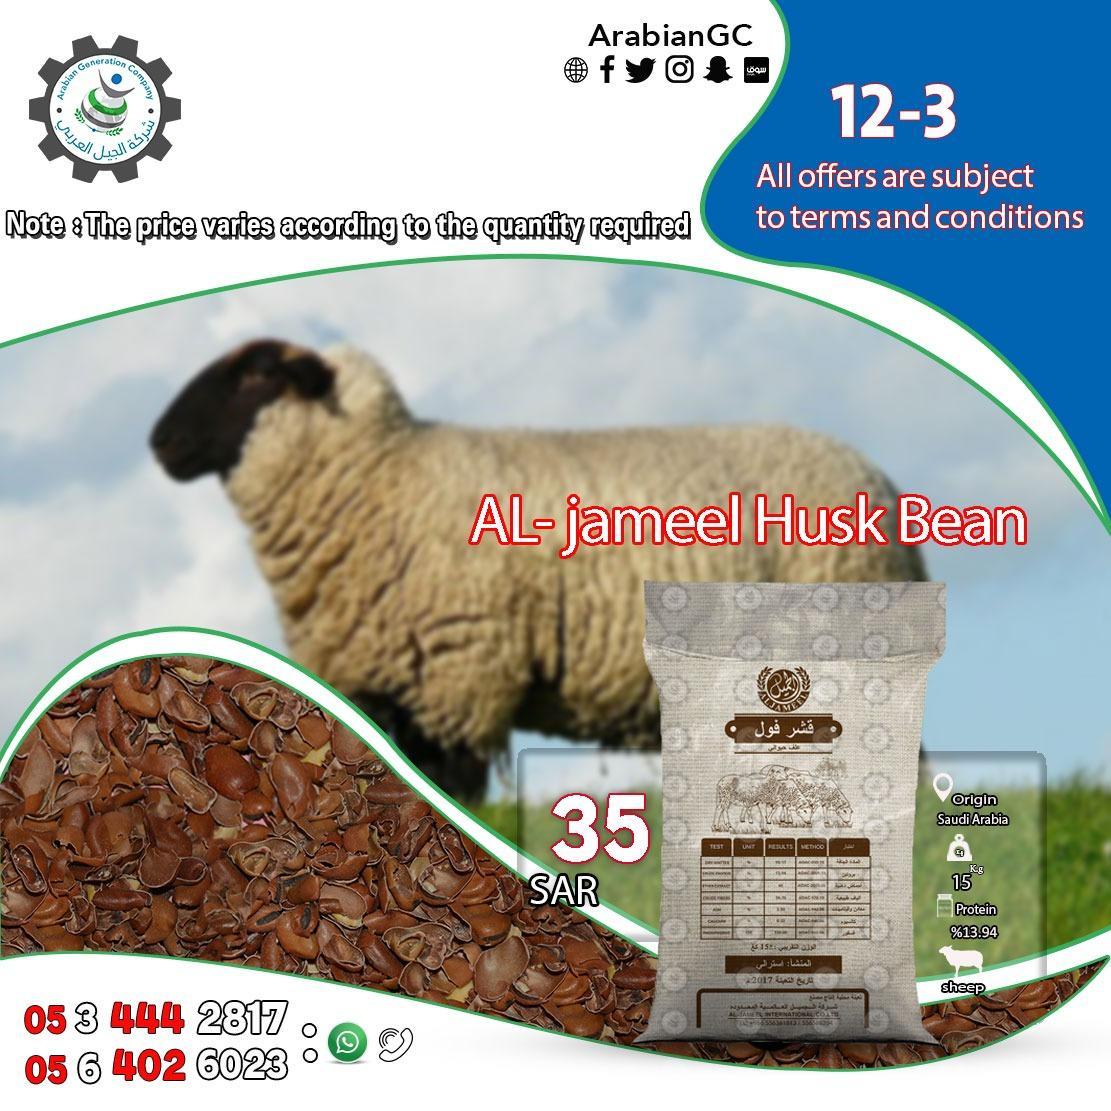 Husk Bean Sale from Arabian d.php?hash=MICZY2B4J